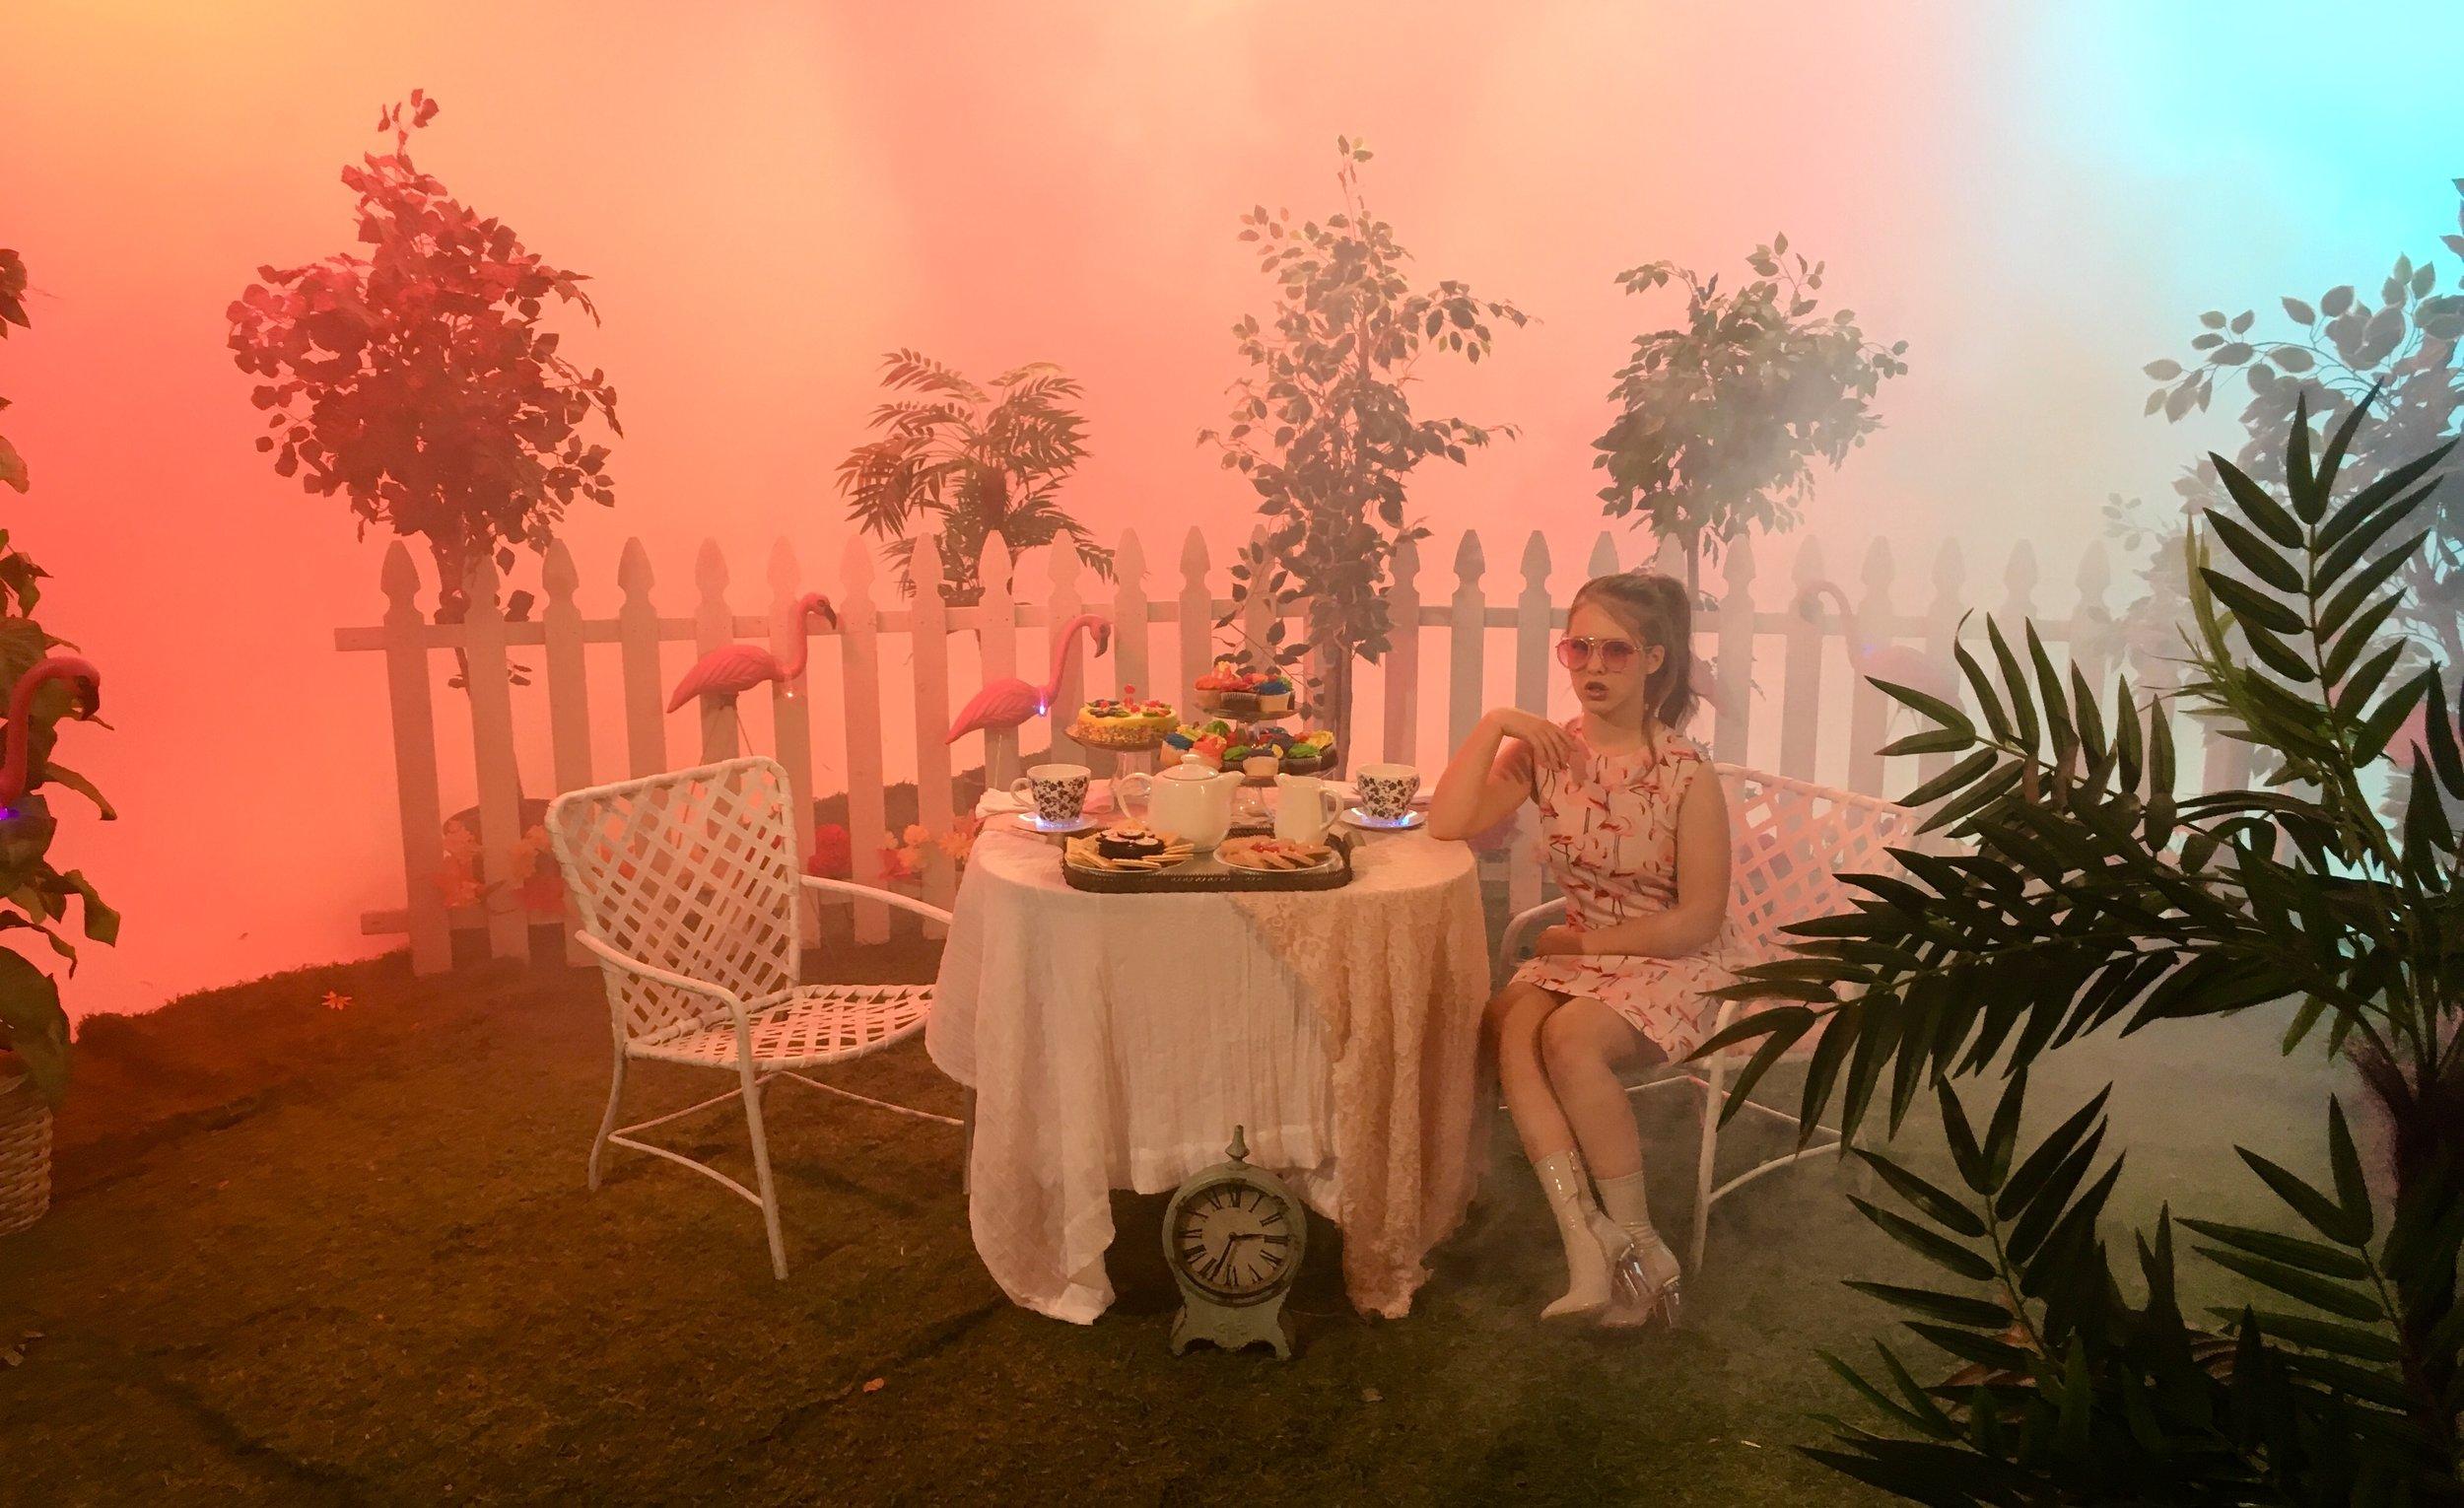 Falmingo / Alice in wonderland tea party scene